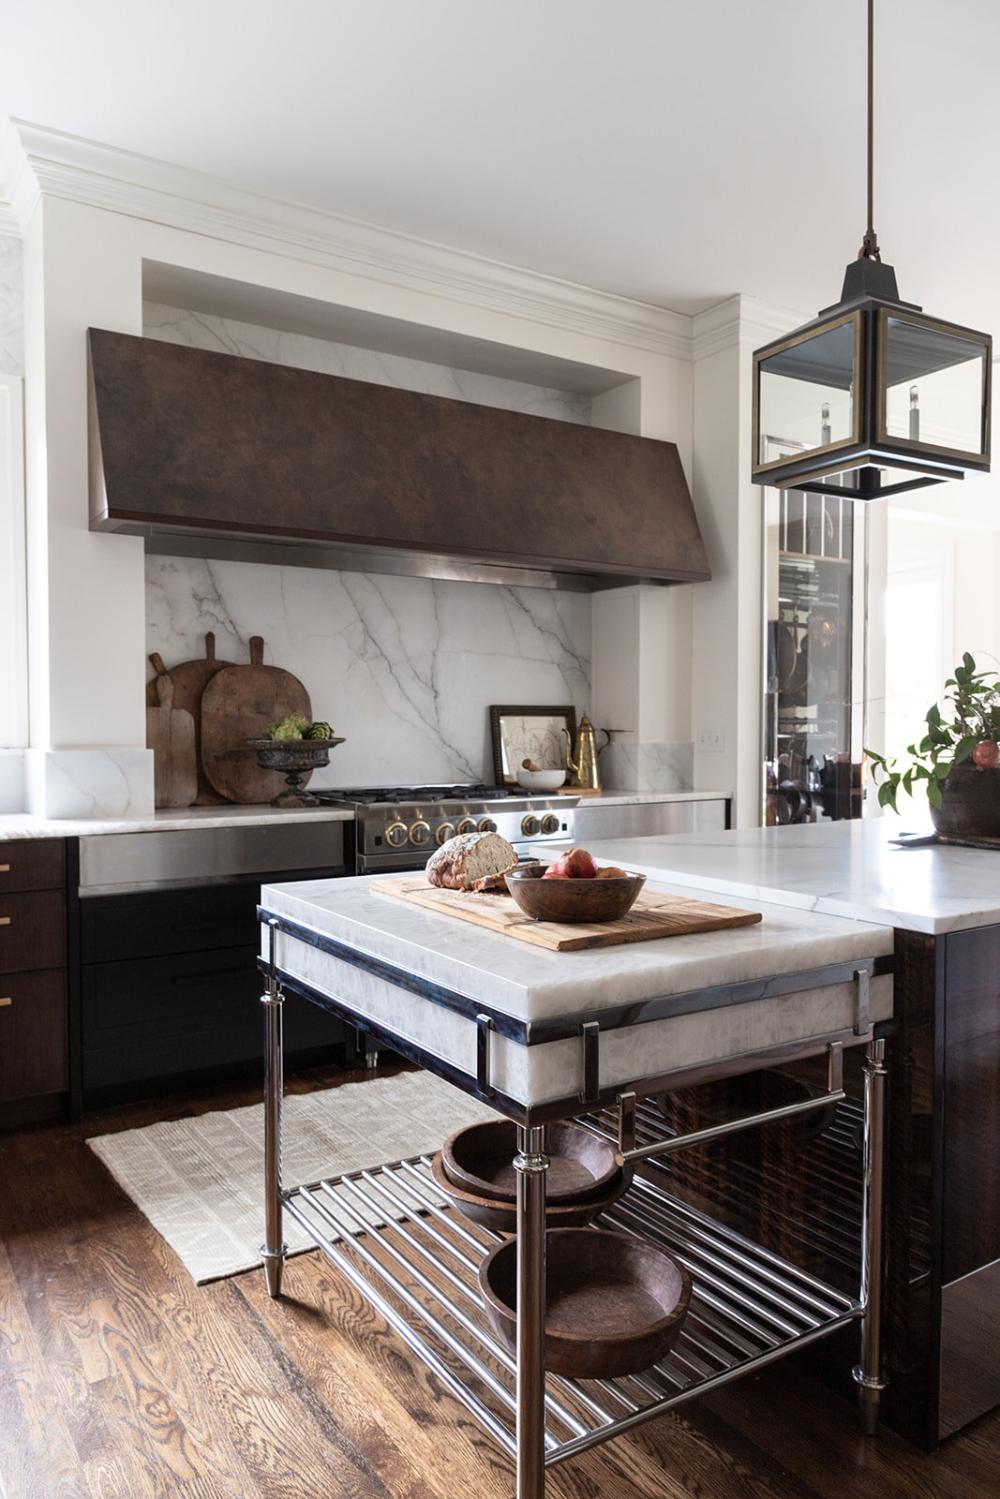 Coming Soon Hli In 2020 Kitchen Interior Home Decor Kitchen Mobile Kitchen Island